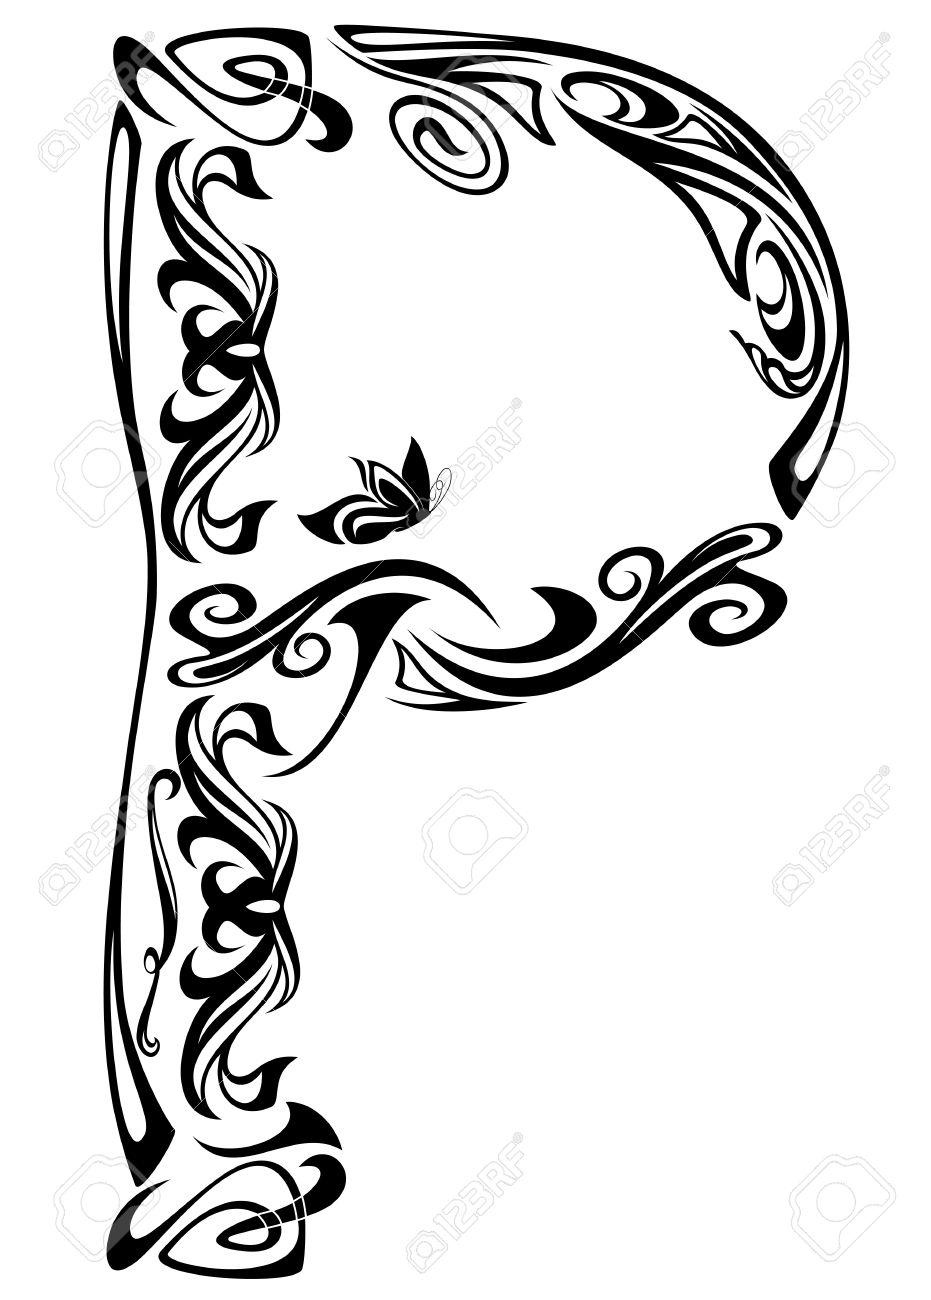 Art Nouveau style vintage font - letter P black and white outline Stock Vector - 11913333